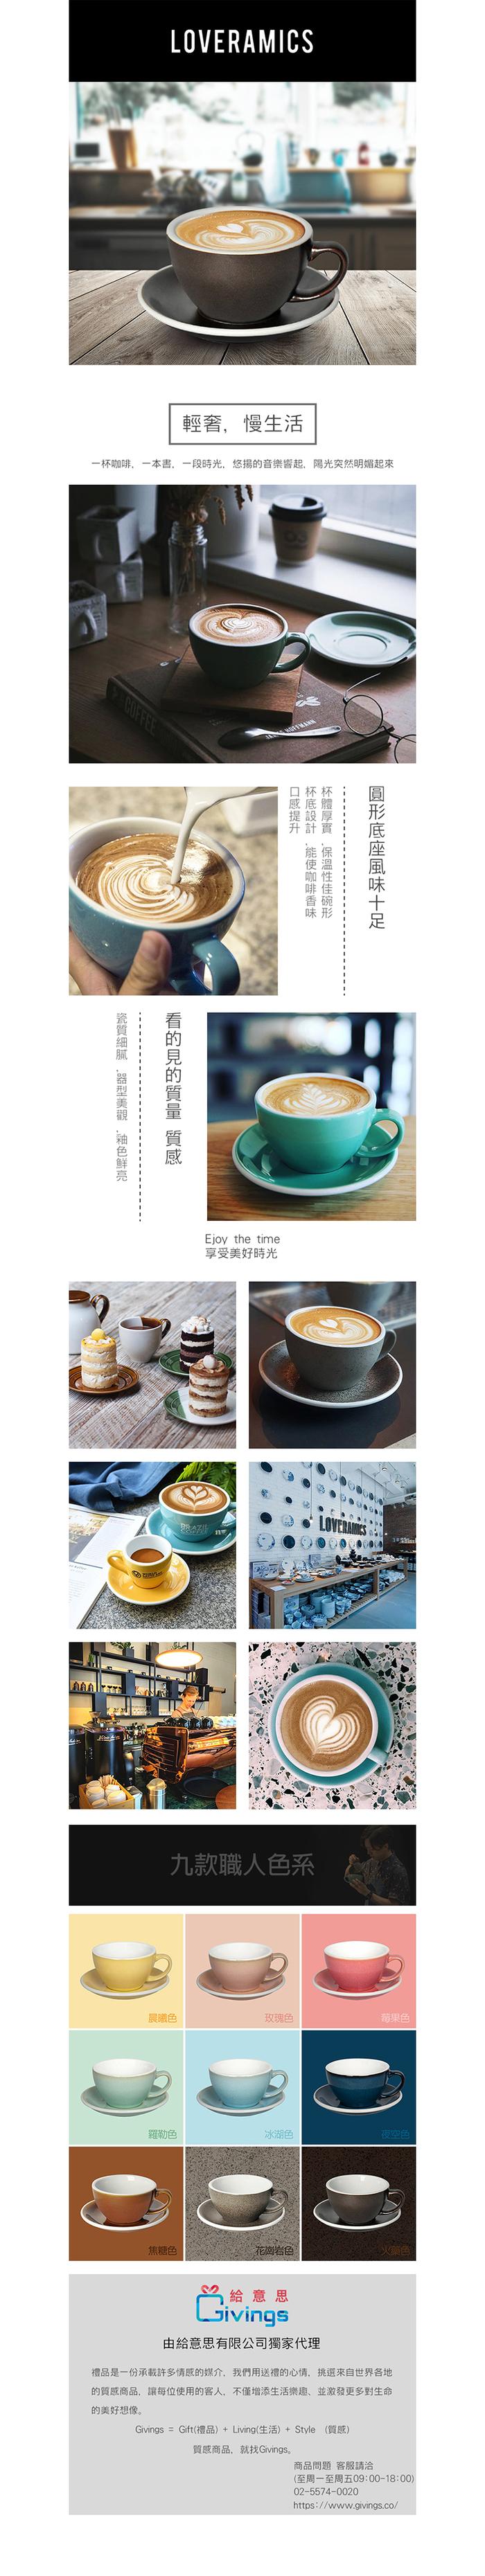 LOVERAMICS 愛陶樂 | 蛋形系列 300ml 拿鐵杯盤組 (職人色系) Egg Cafe Latte Cup & Saucer (九色)